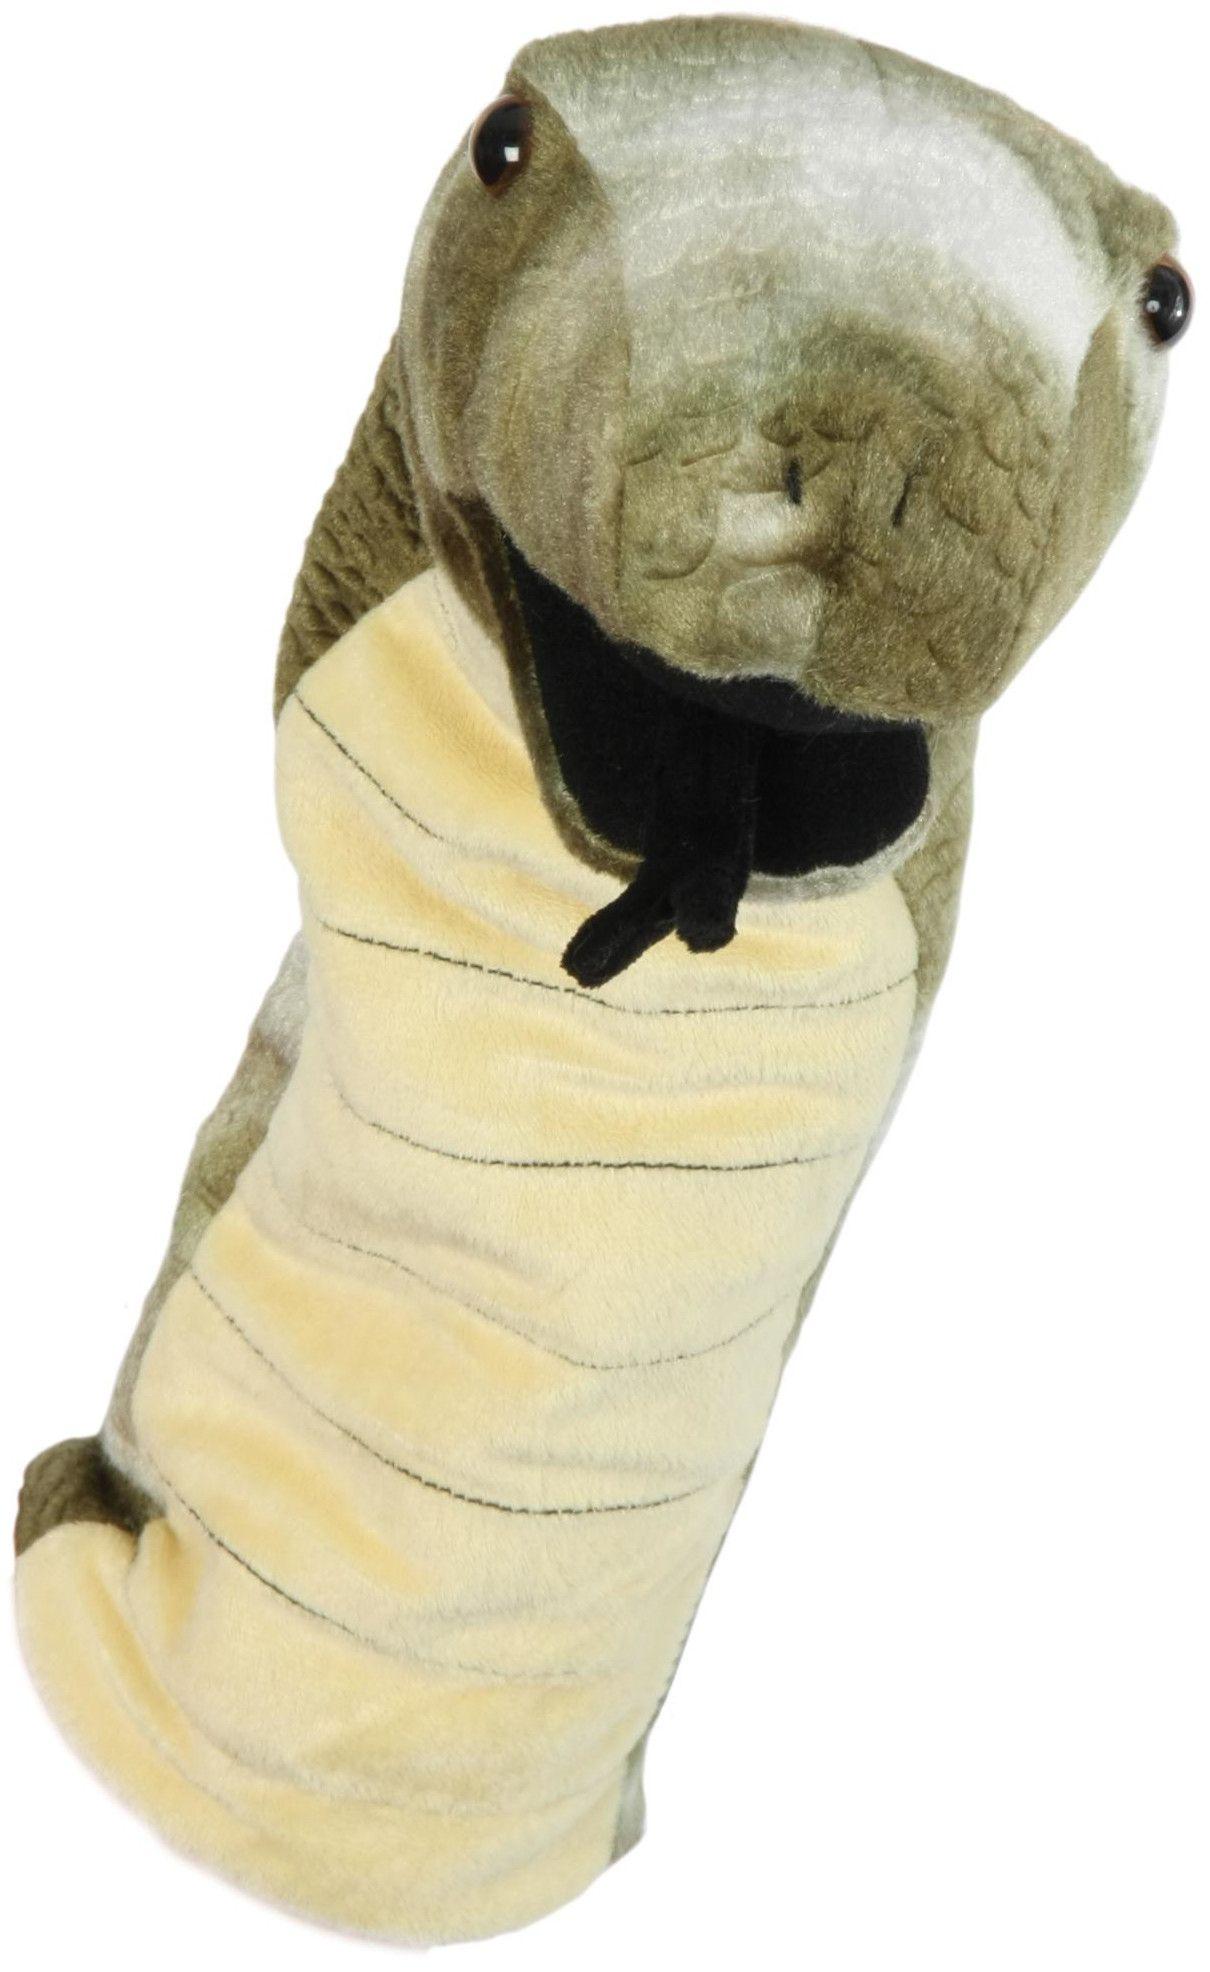 Кукла за куклен театър The Puppet Company - Змия, 38 cm - 1